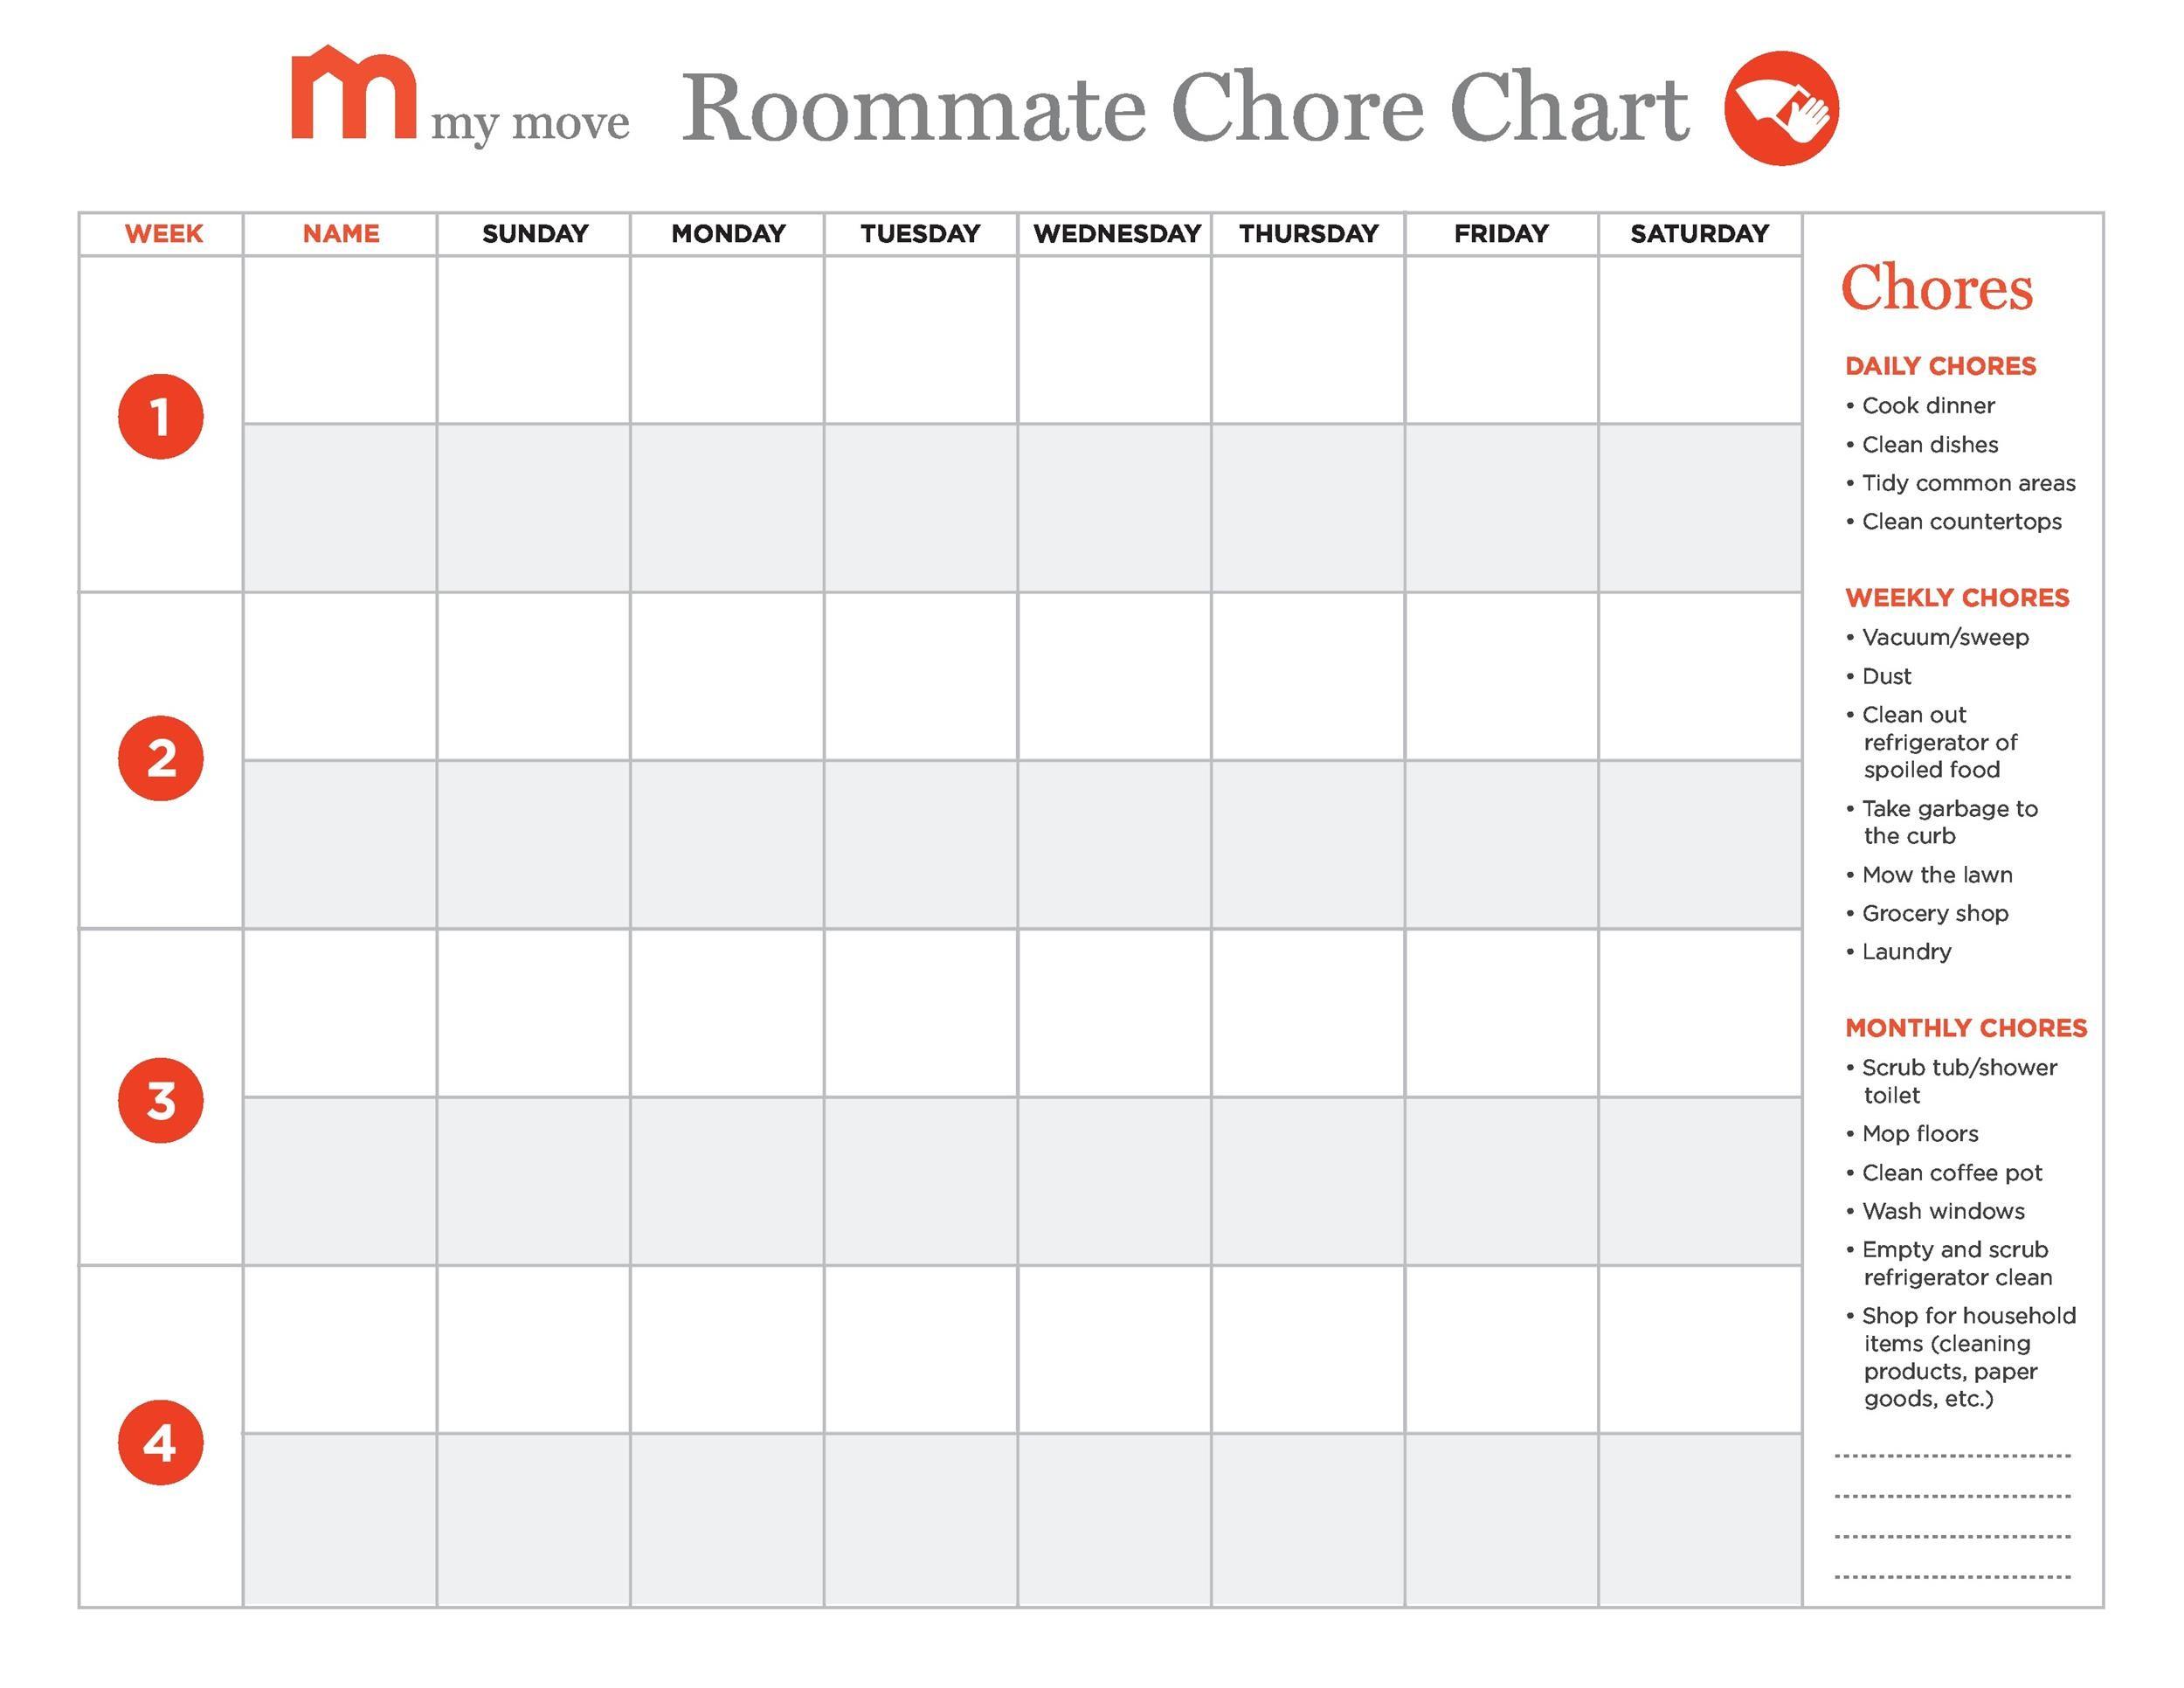 Free chore chart template 10